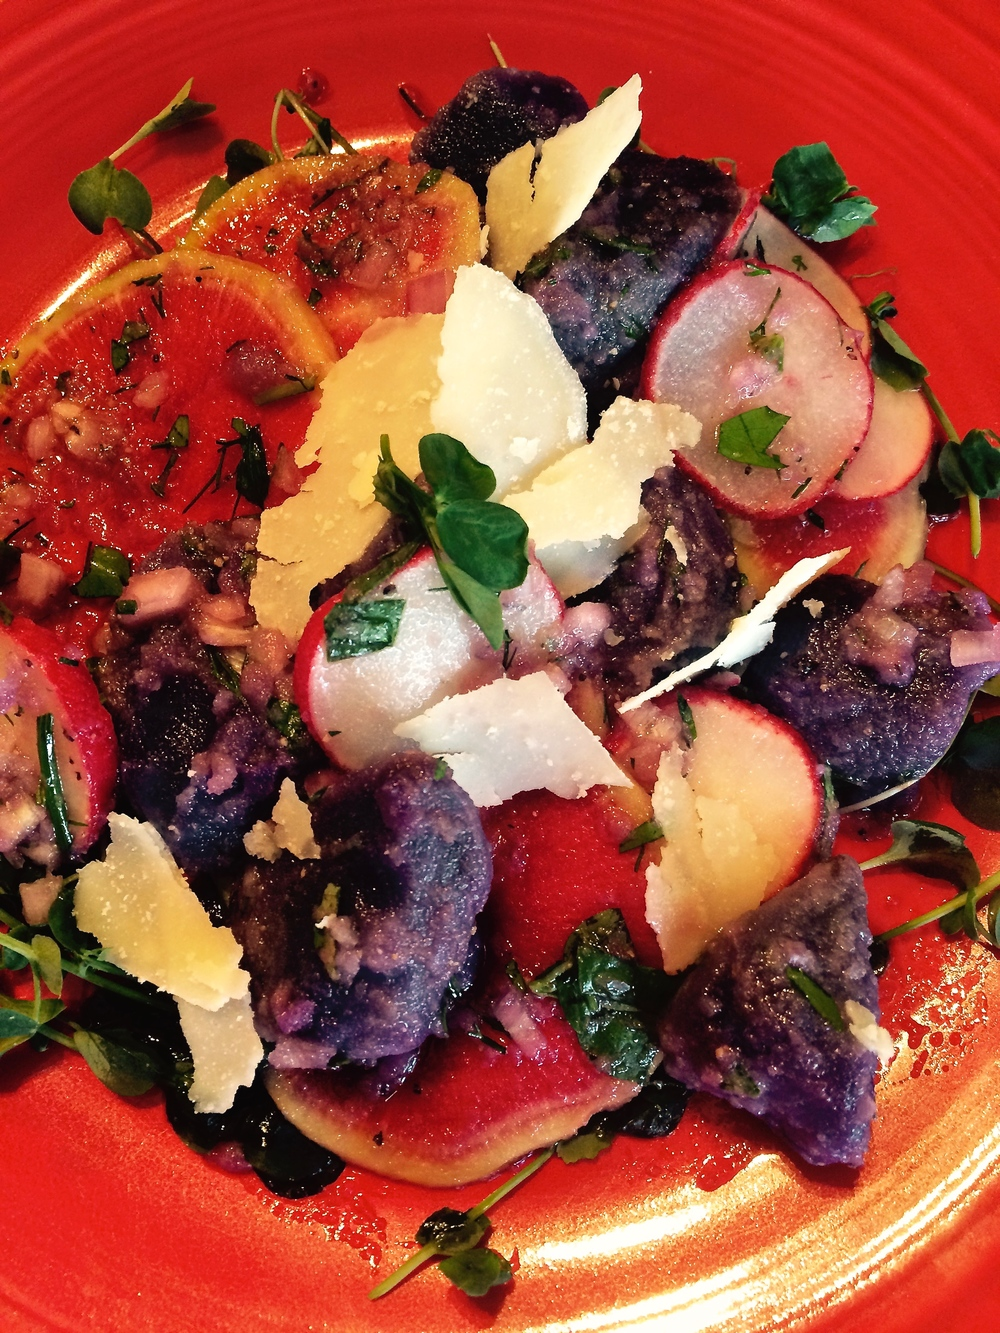 TST_redwhiteblue_potatosalad_recipe_photo.jpg